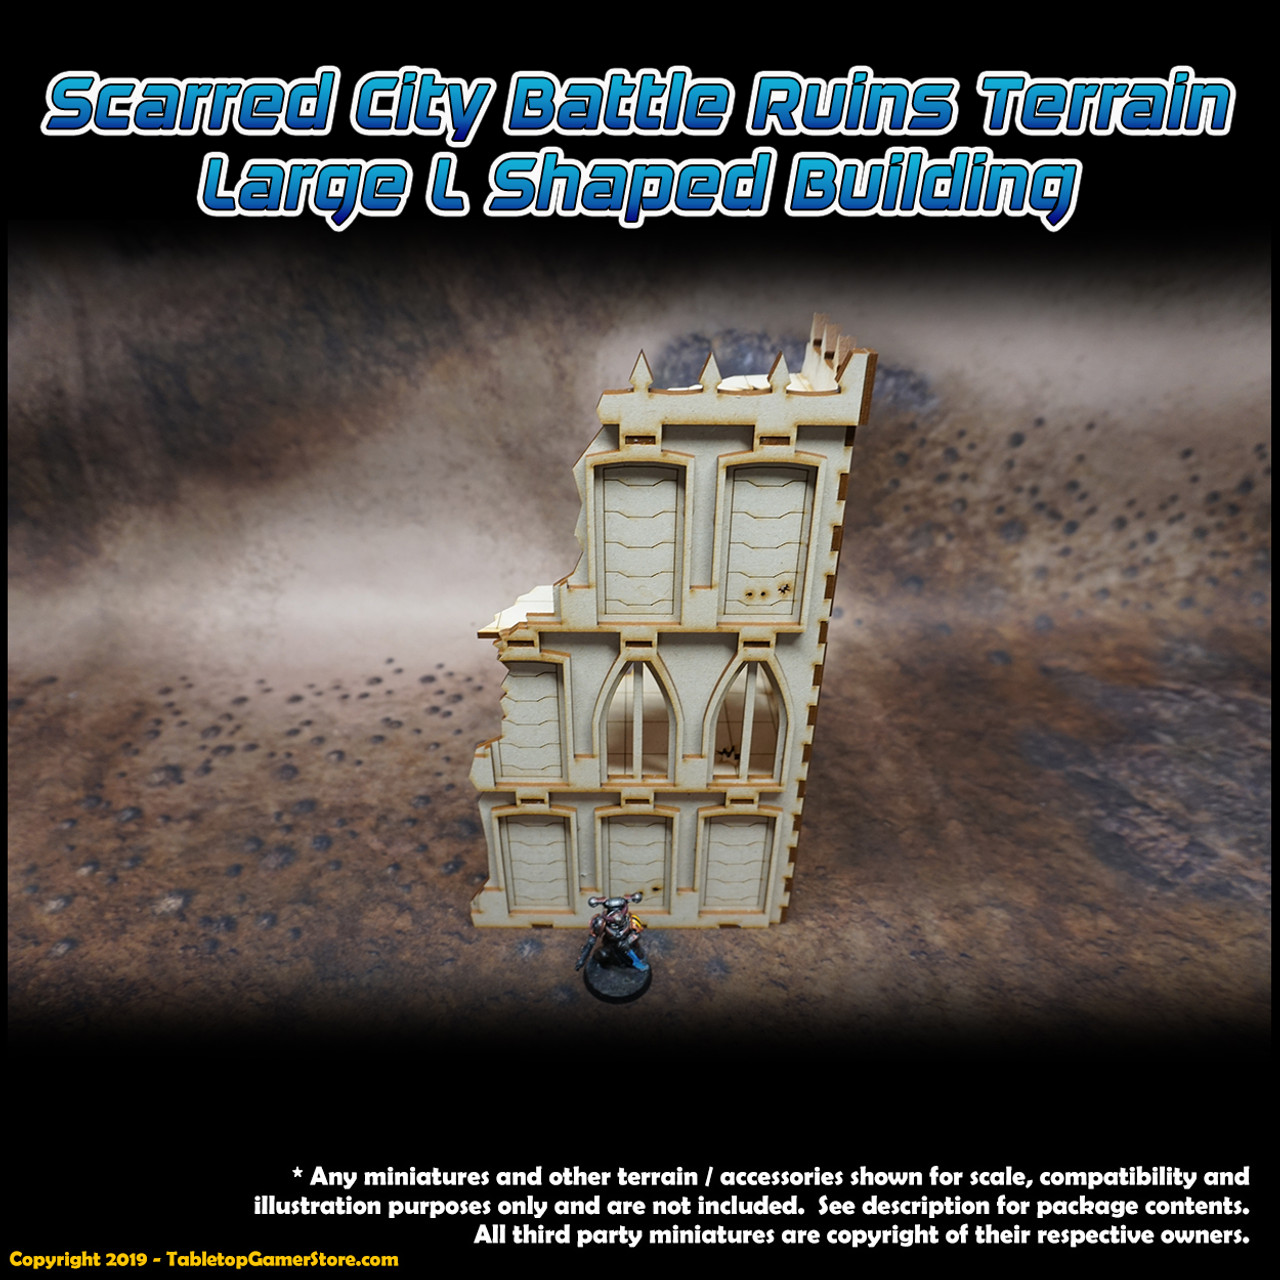 Scarred City Battle Ruins Terrain - Large L Shaped Building